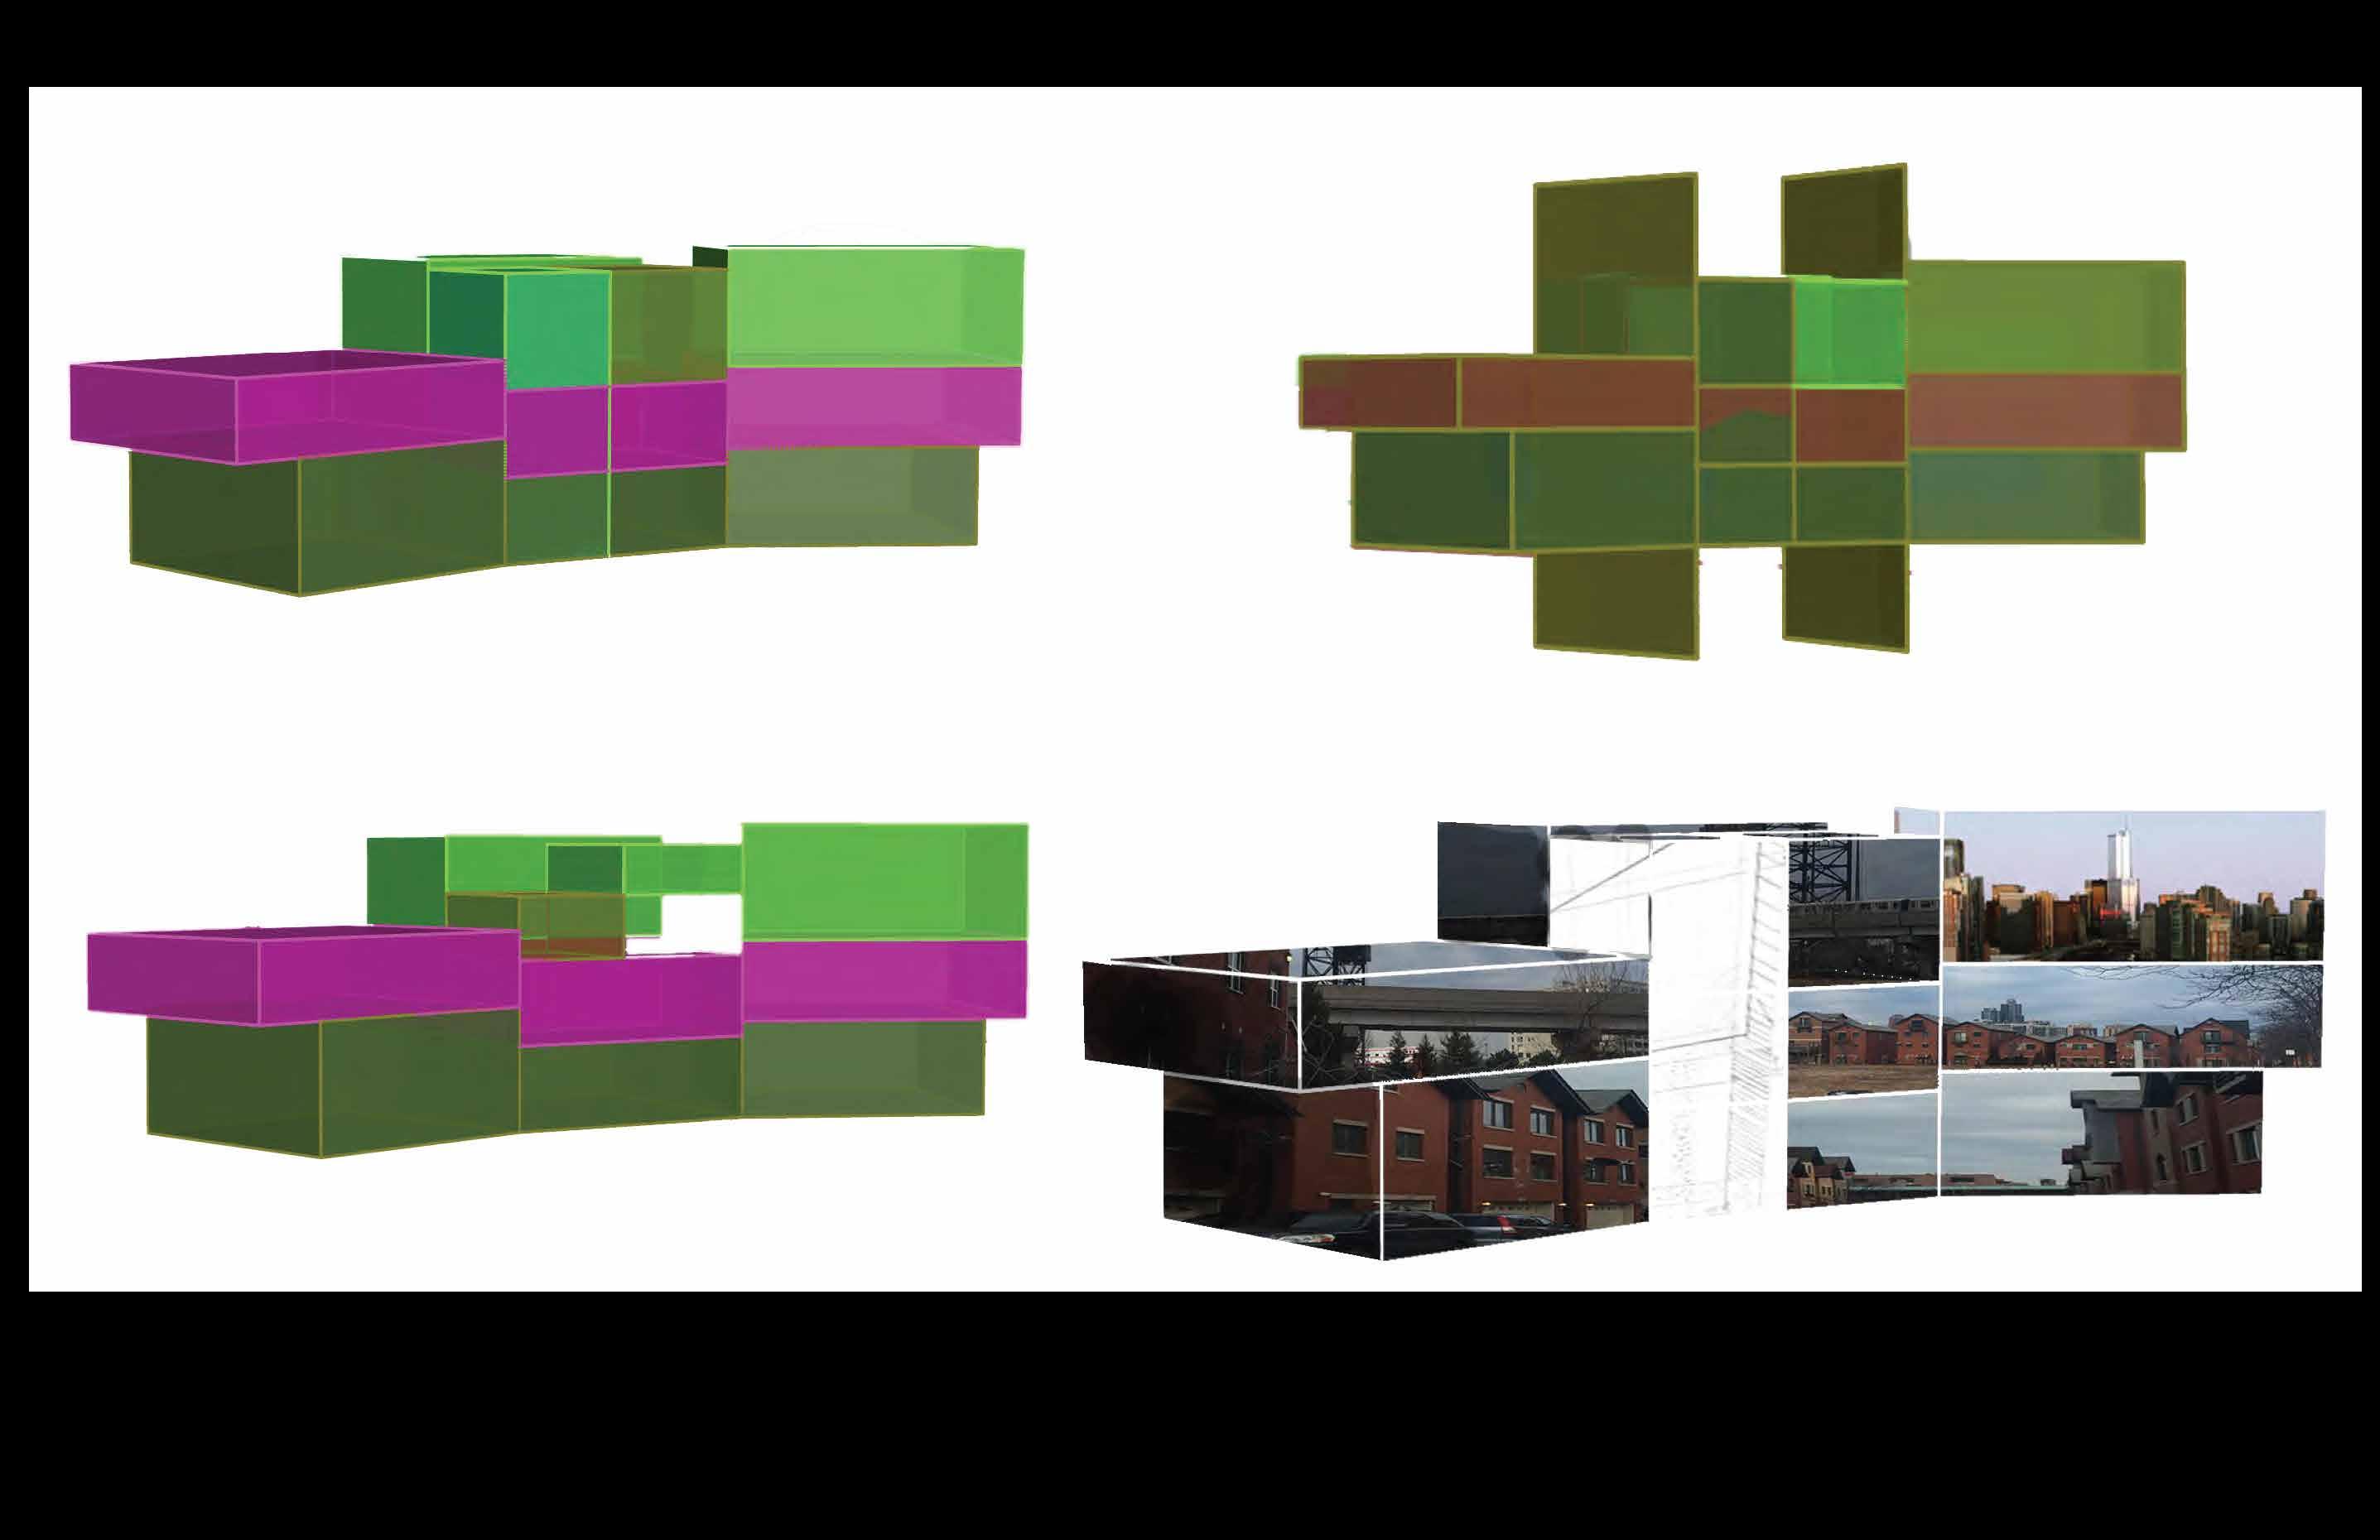 program dispersal study